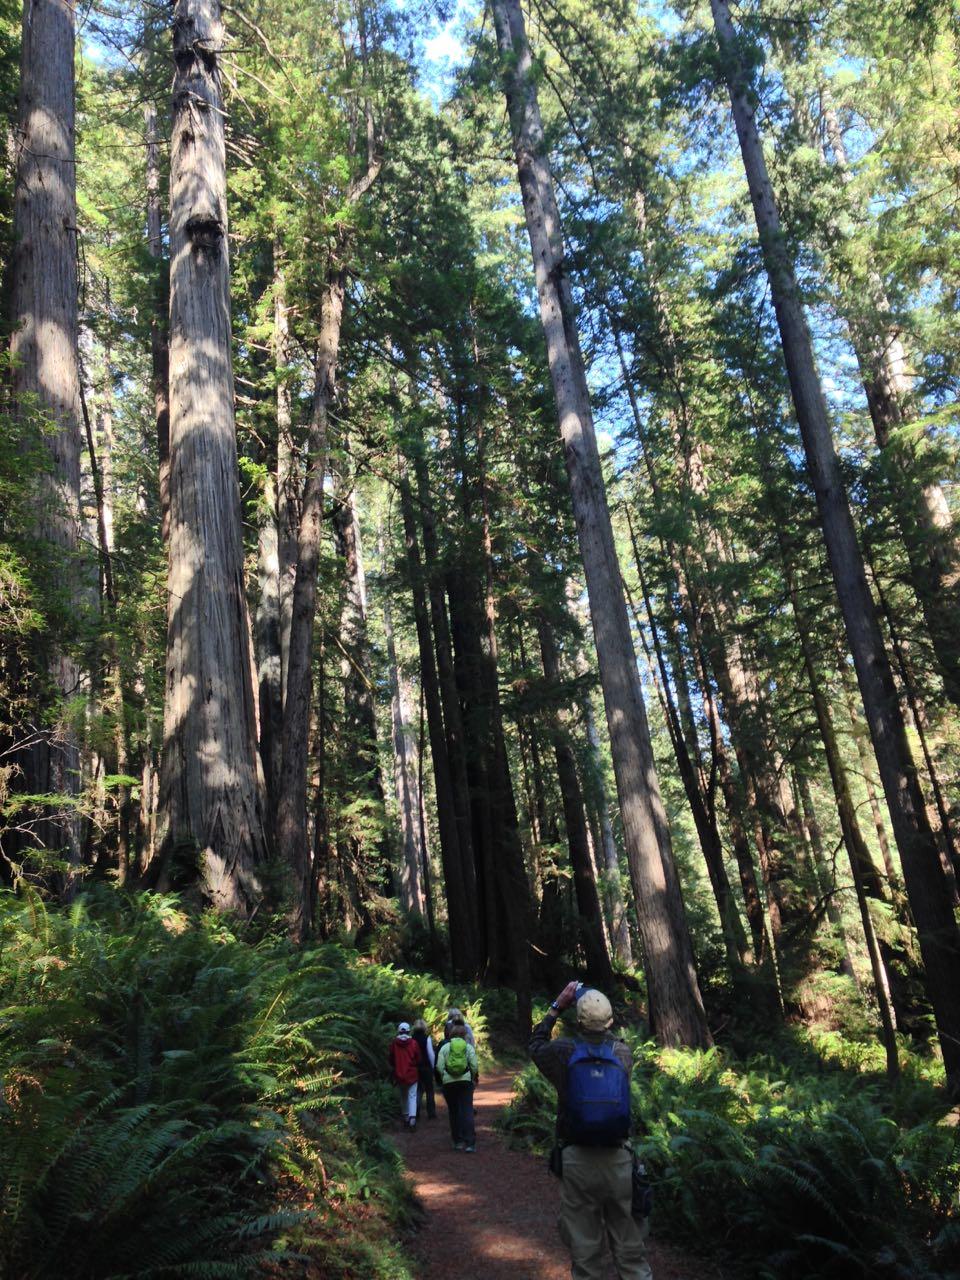 Redwoods 2017 10 08 267 Of 287